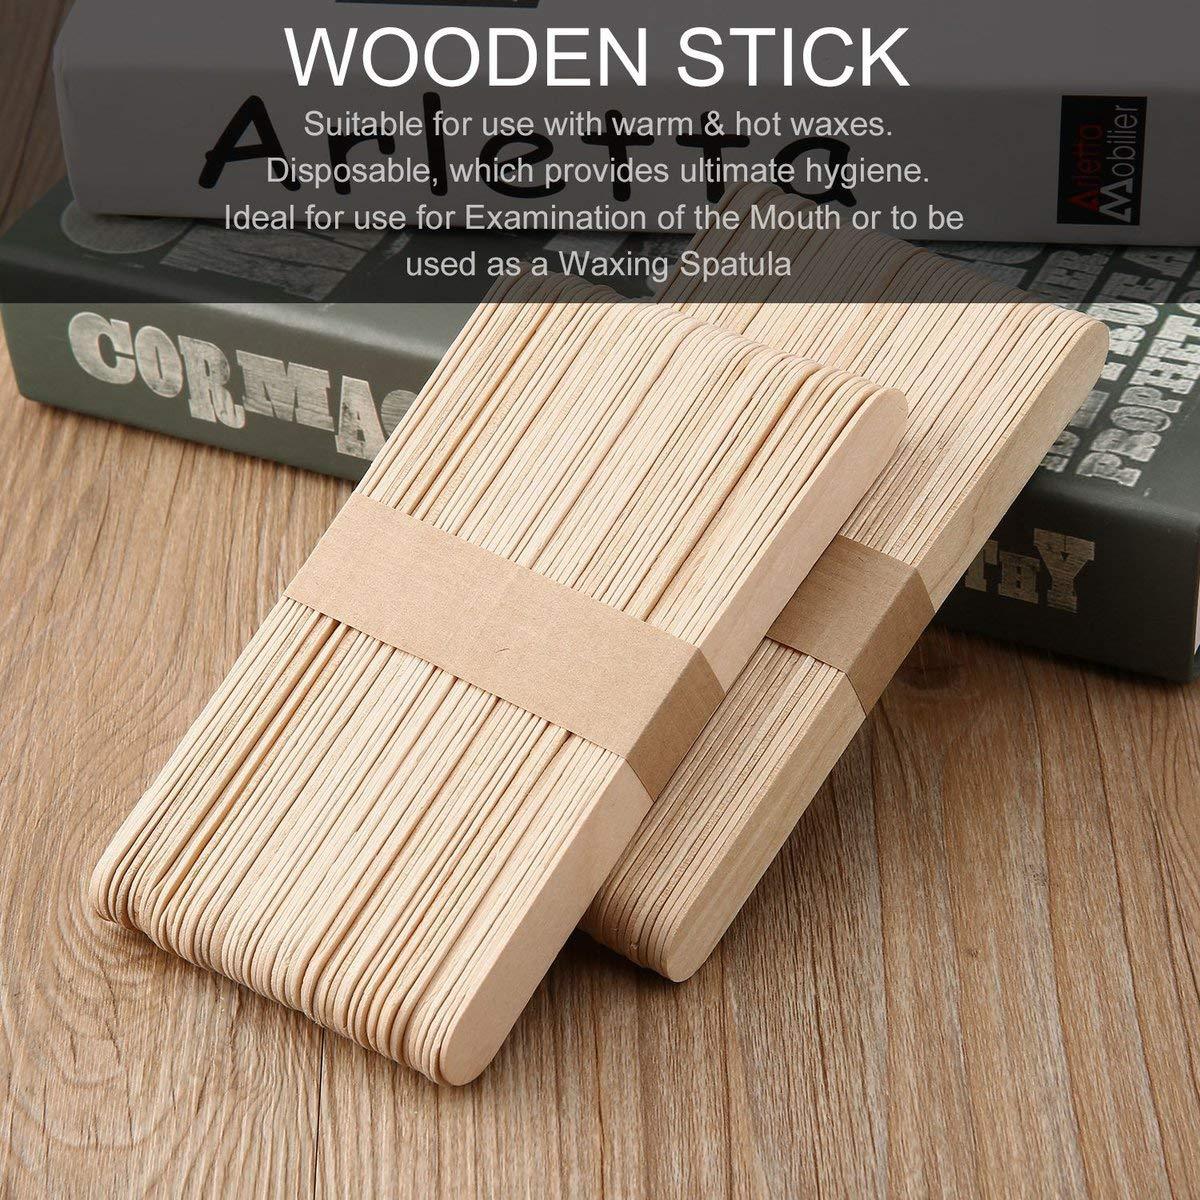 100pcs set Holzspatel Waxing Wax Spatel medizinische Einweg Bambus-Sticks of Health Wood Beauty-Stick